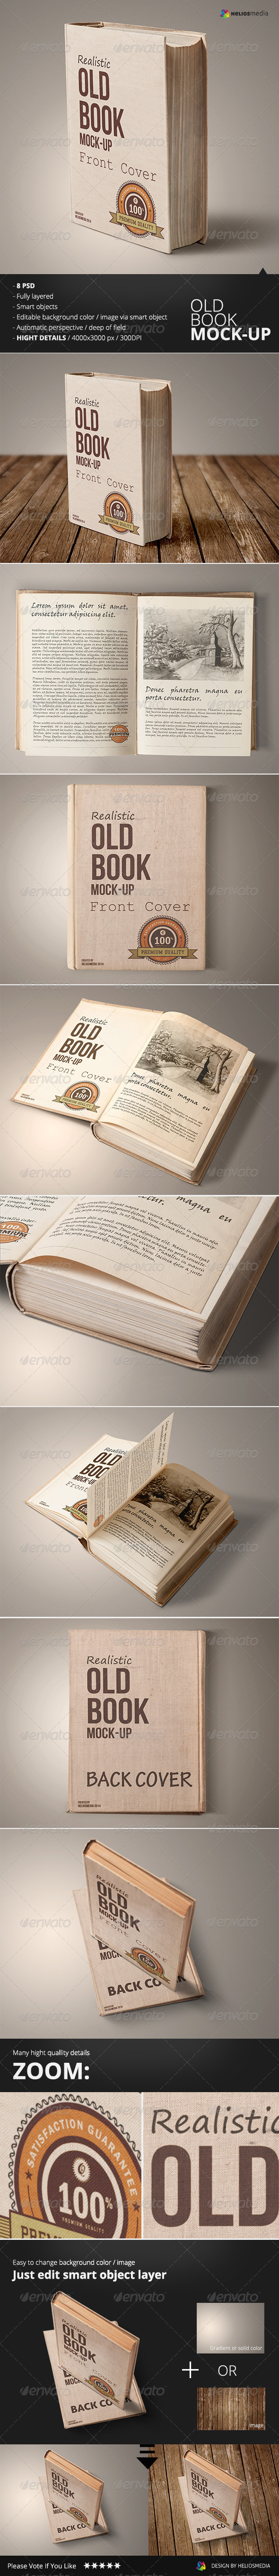 GraphicRiver Old Book Mockup 6553642